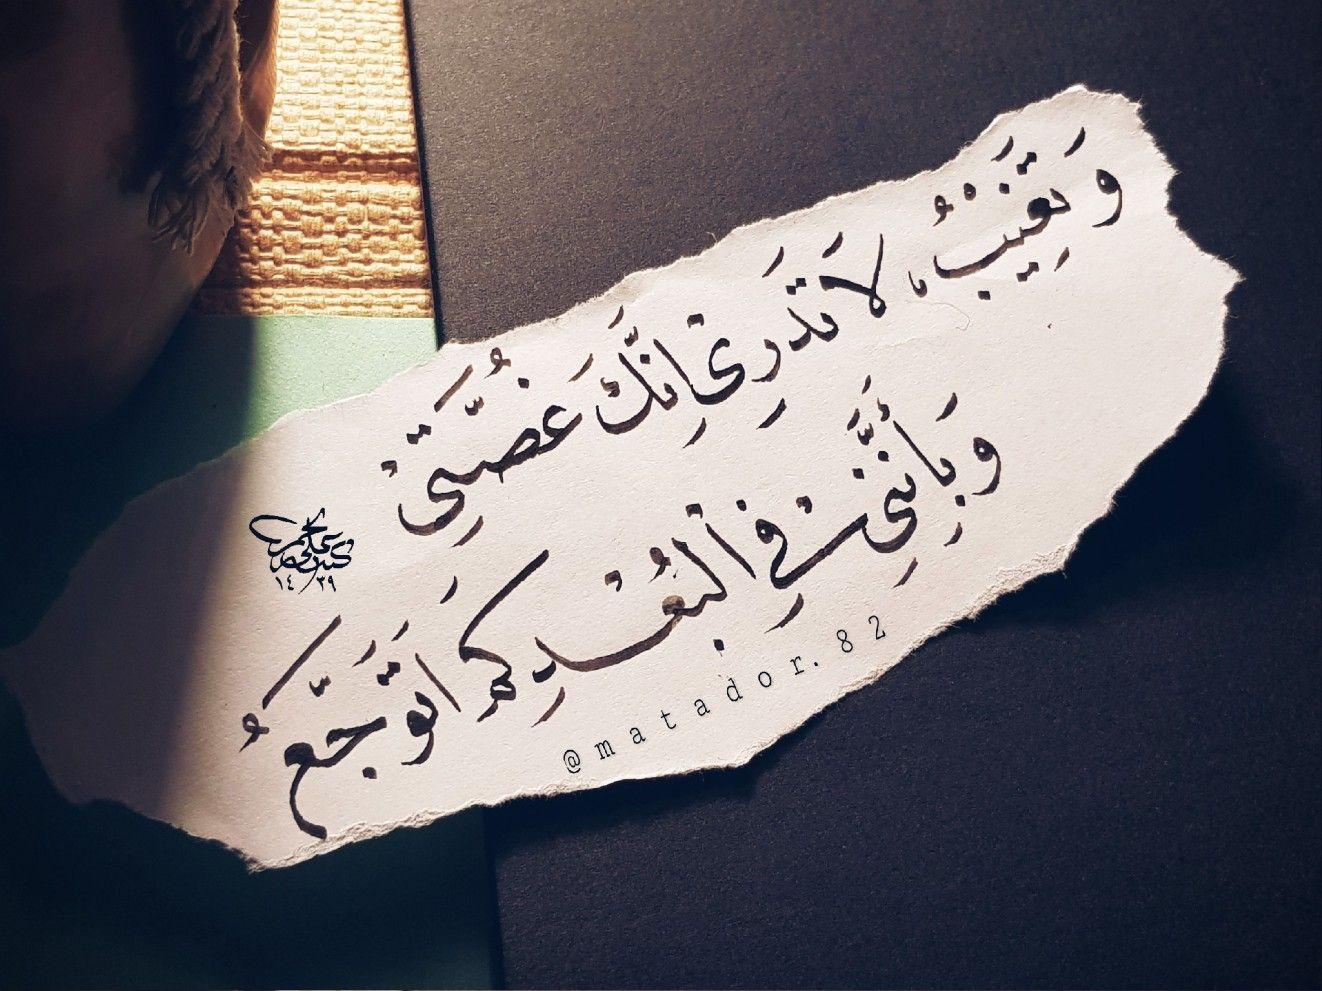 و تغيب لا تدري انك غصتي خواطر العراق خط عربي Writing Words Calligraphy I Words